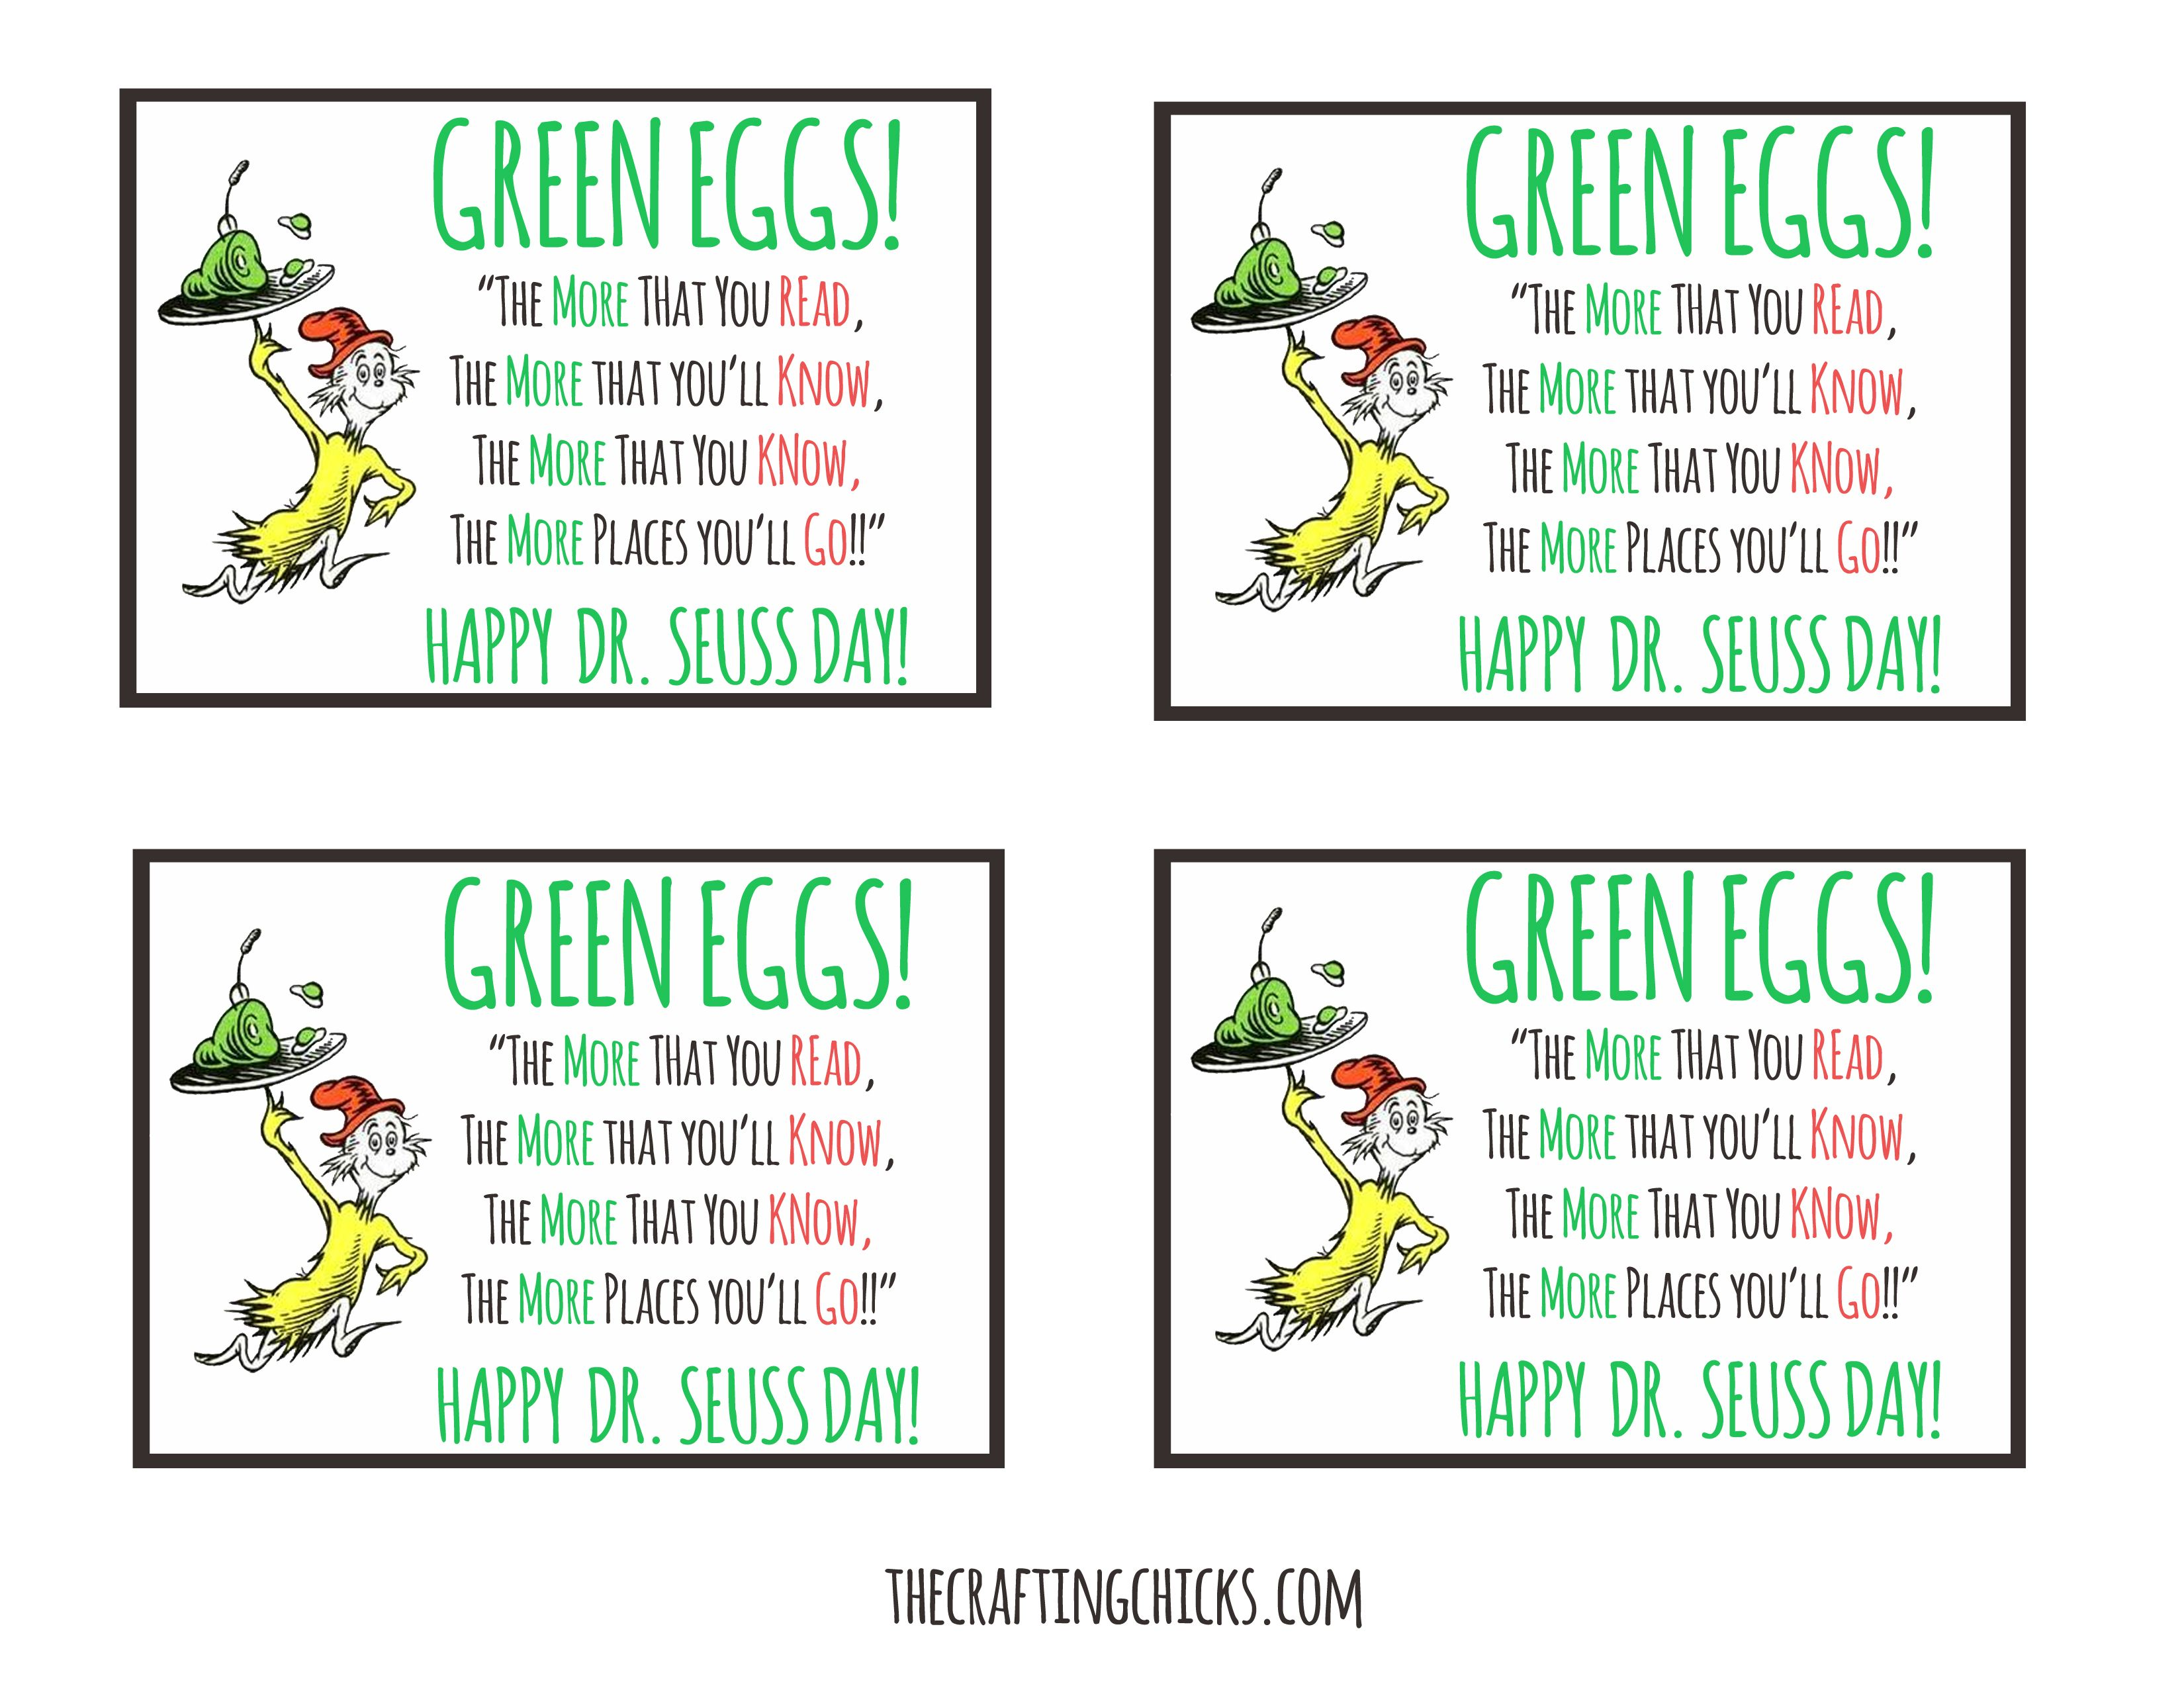 worksheet. Dr Seuss Worksheets Free. Grass Fedjp Worksheet Study Site